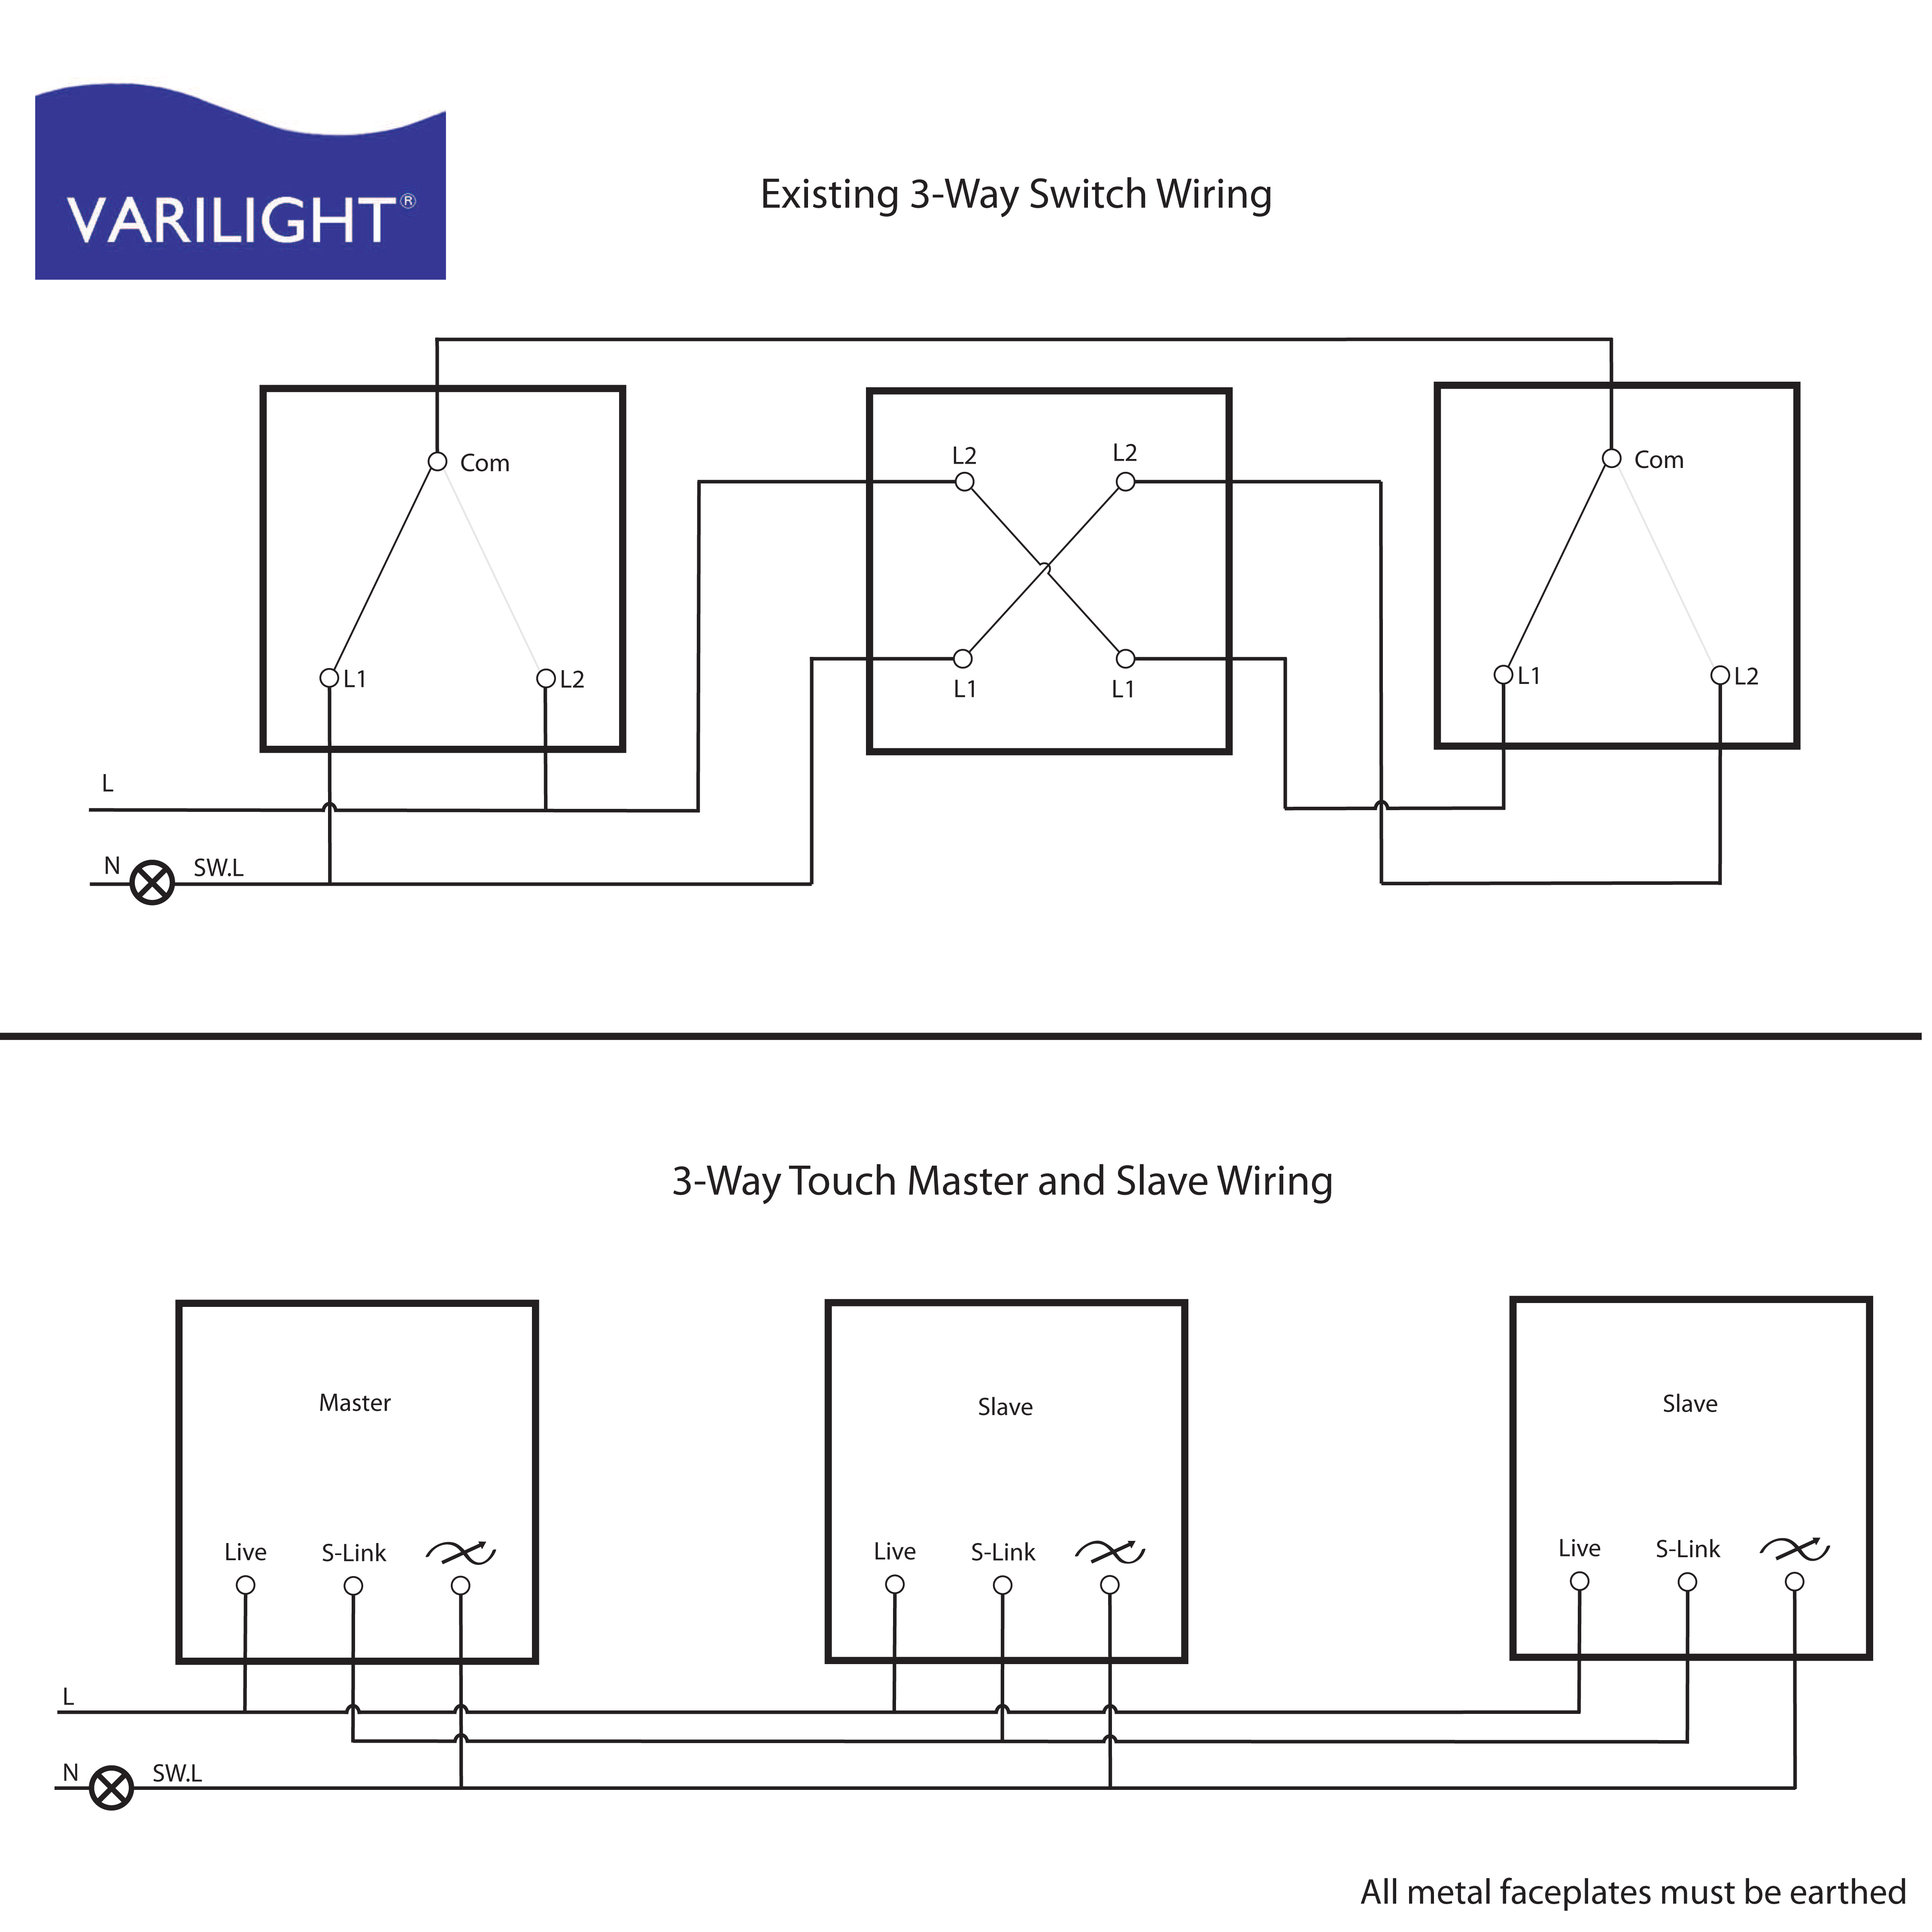 Varilight Wiring Diagrams - 3 Pole Switch Wiring Diagram